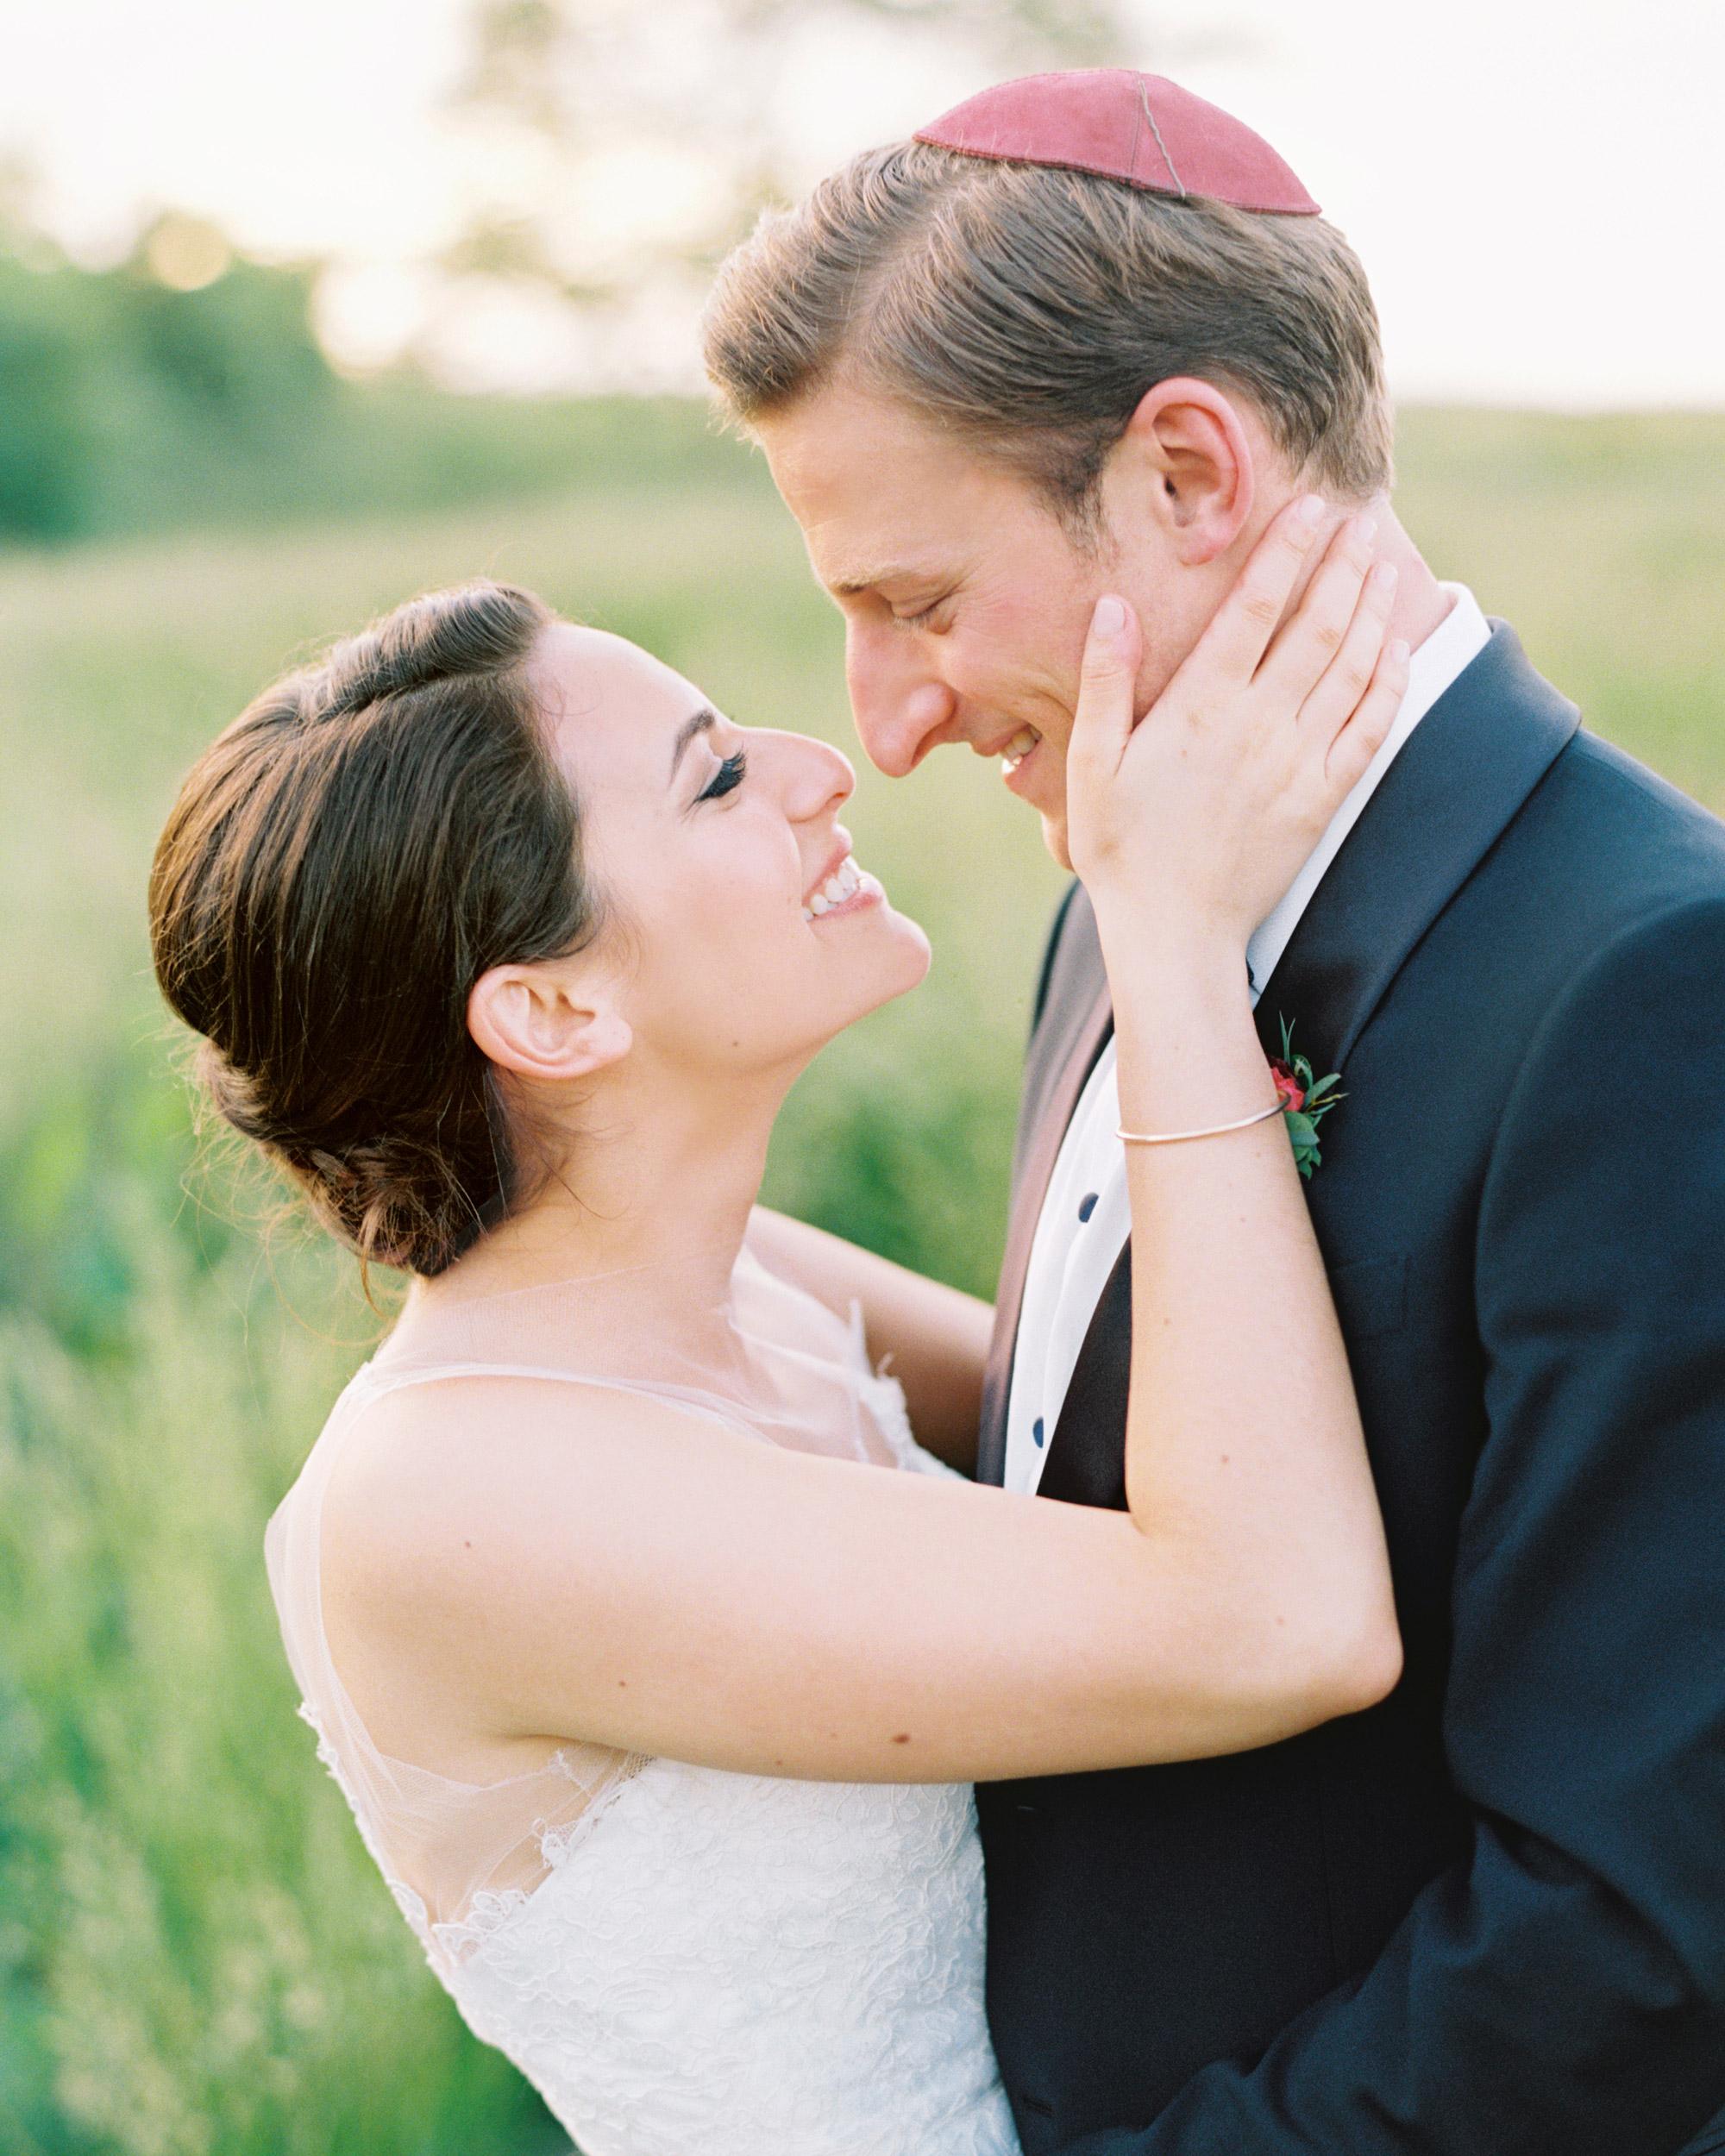 sasha-tyler-wedding-virginia-couple-59-s112867.jpg